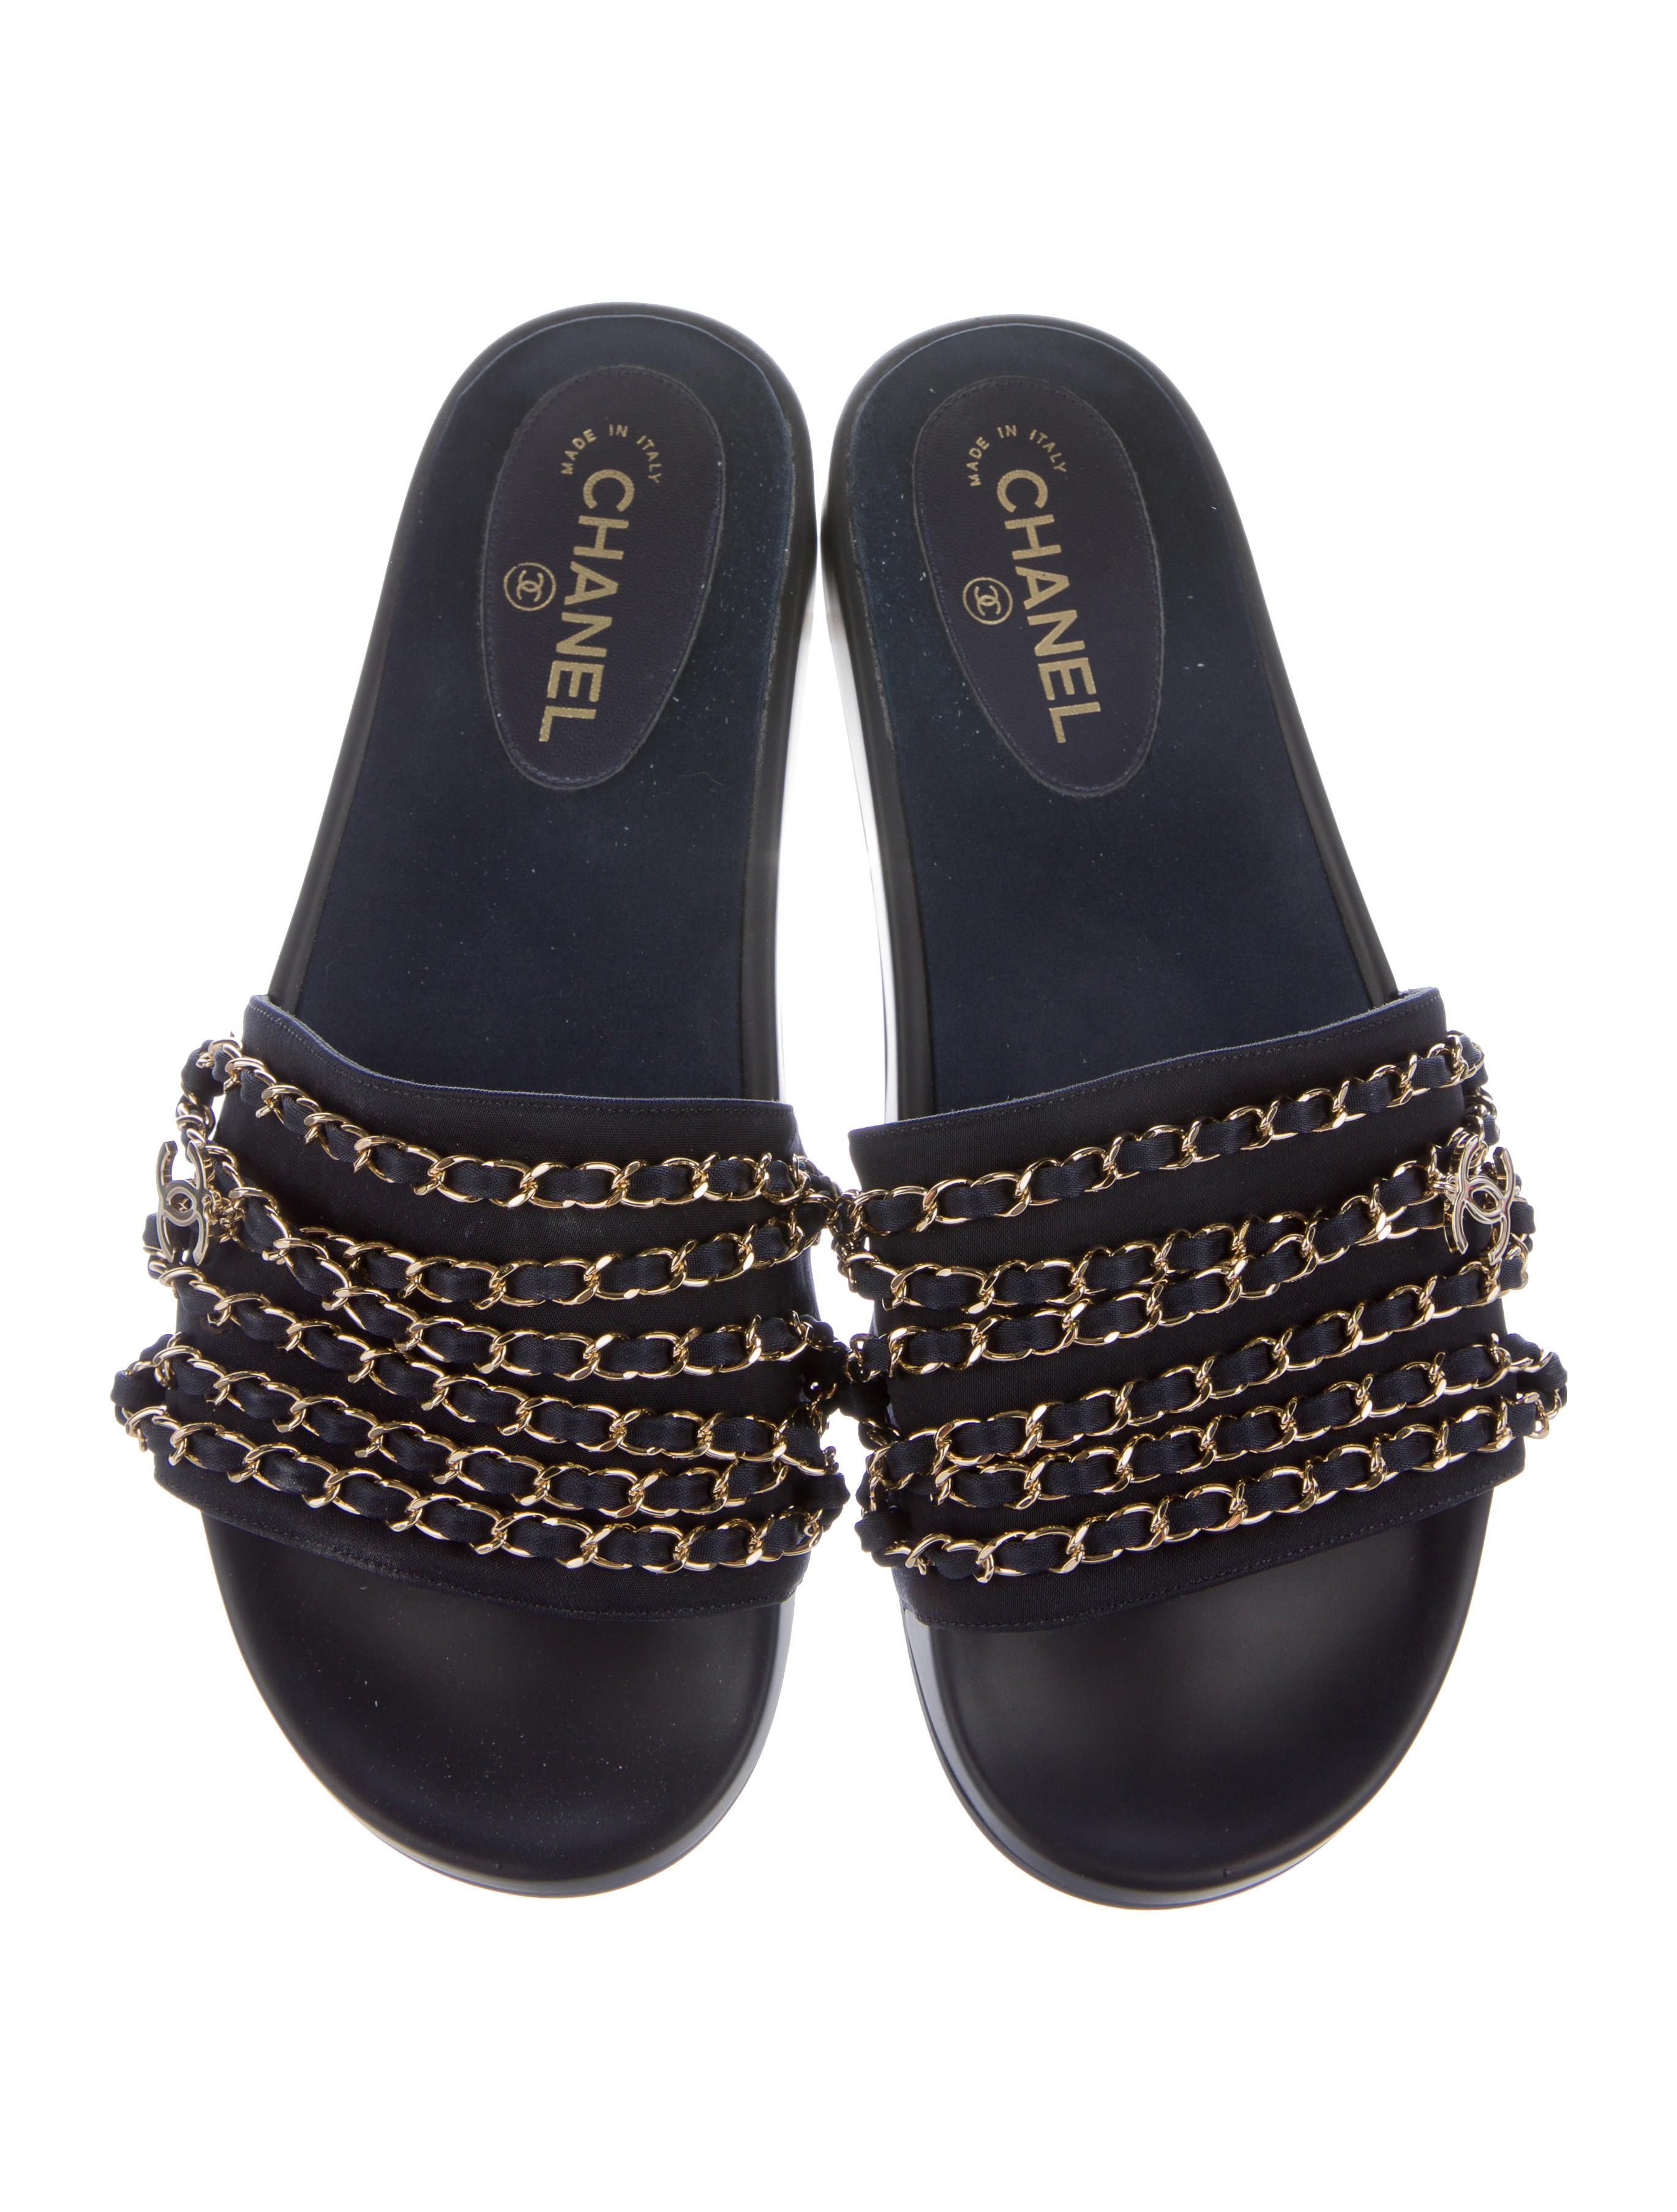 Chanel 2017 Tropiconic Slide Sandals Shoes CHA